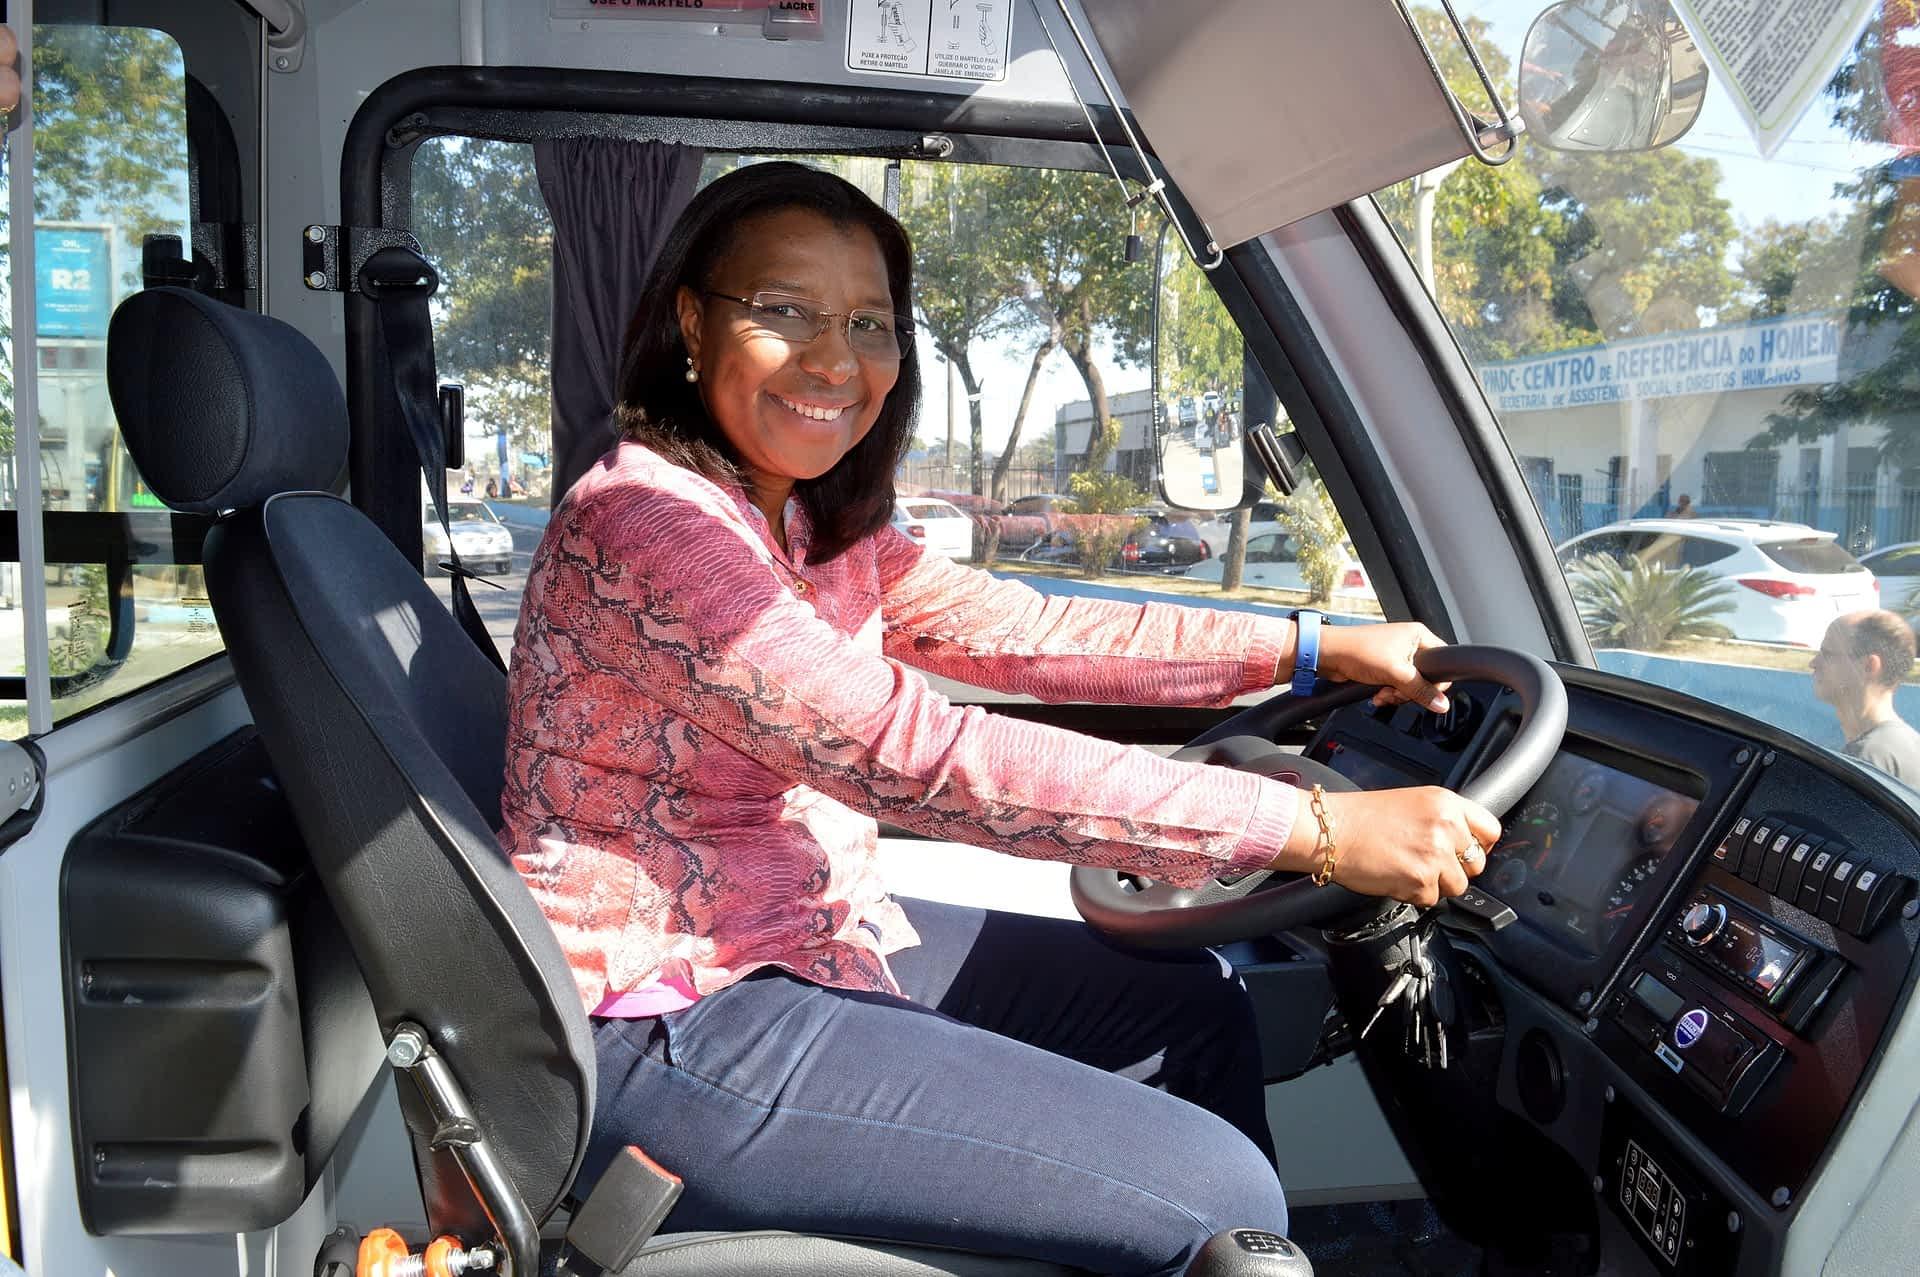 11111 Entrega de ônibus em Duque de Caxias